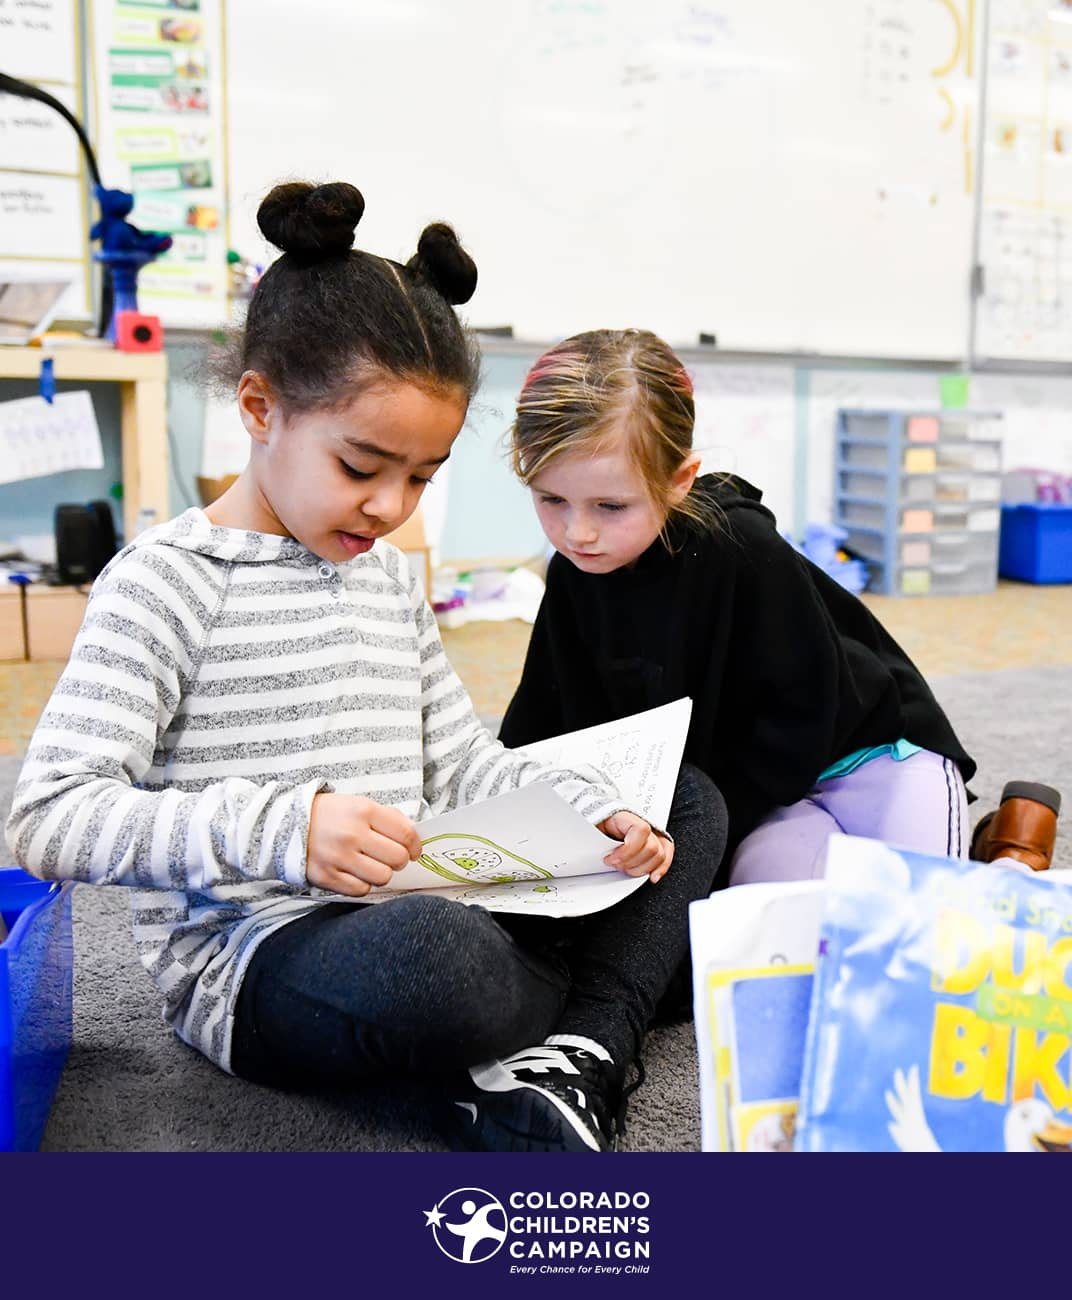 Girls reading in school program for Colorado Children's Campaign